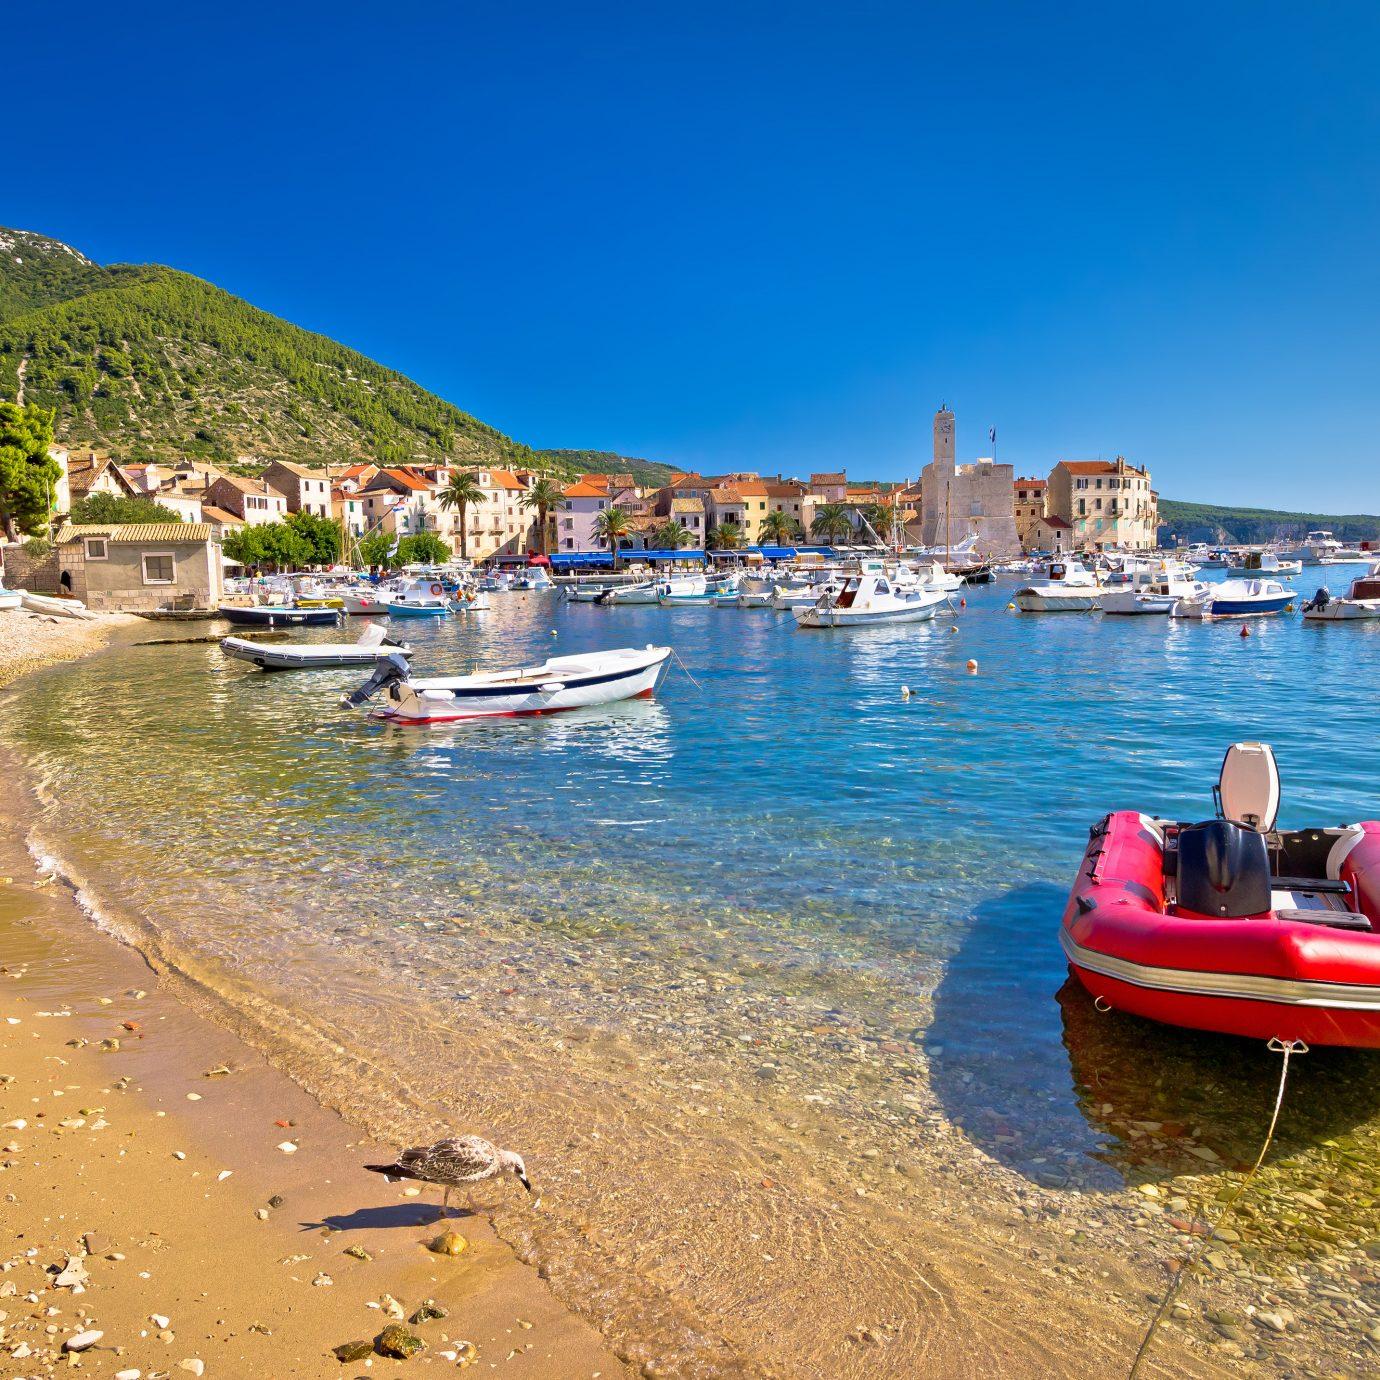 Sand beach in Komiza fishermen village, Island of Vis, Croatia